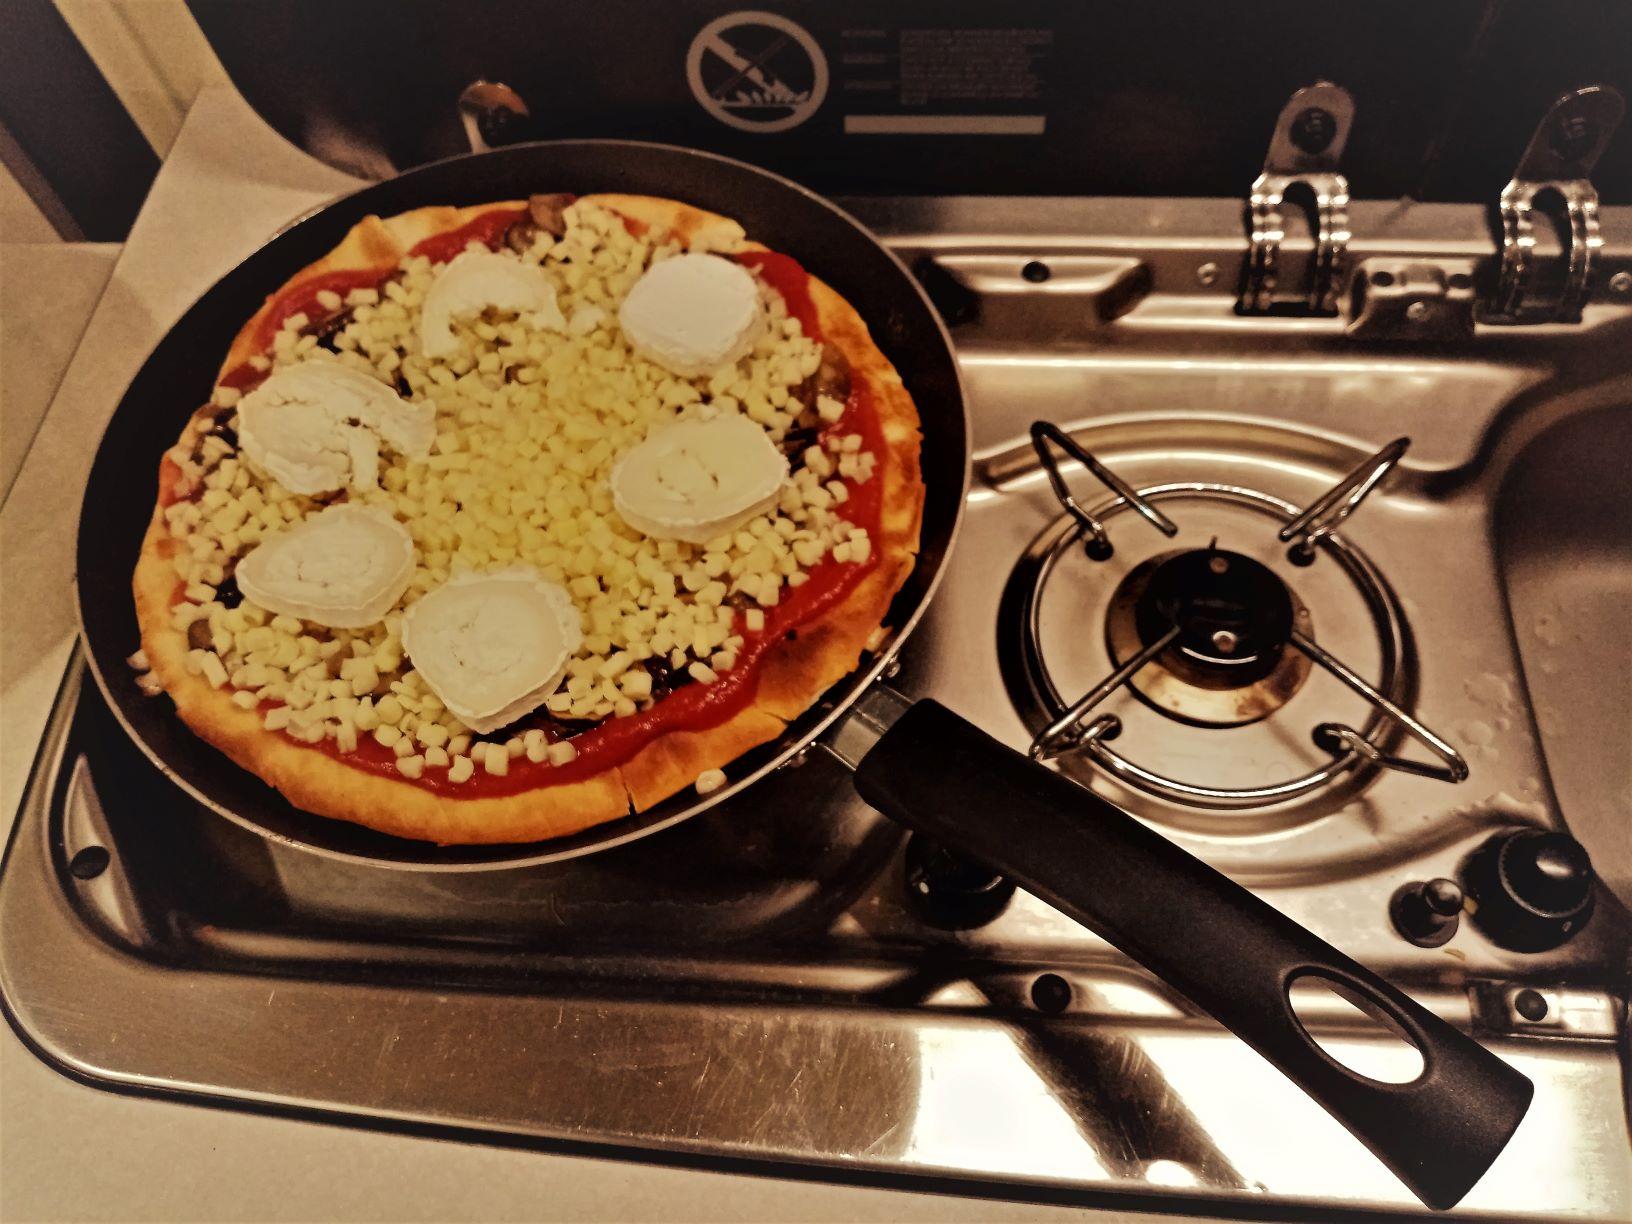 Garnissage Pizza Tomate Fromage Champignons Idee Recette Facile Roadtrip